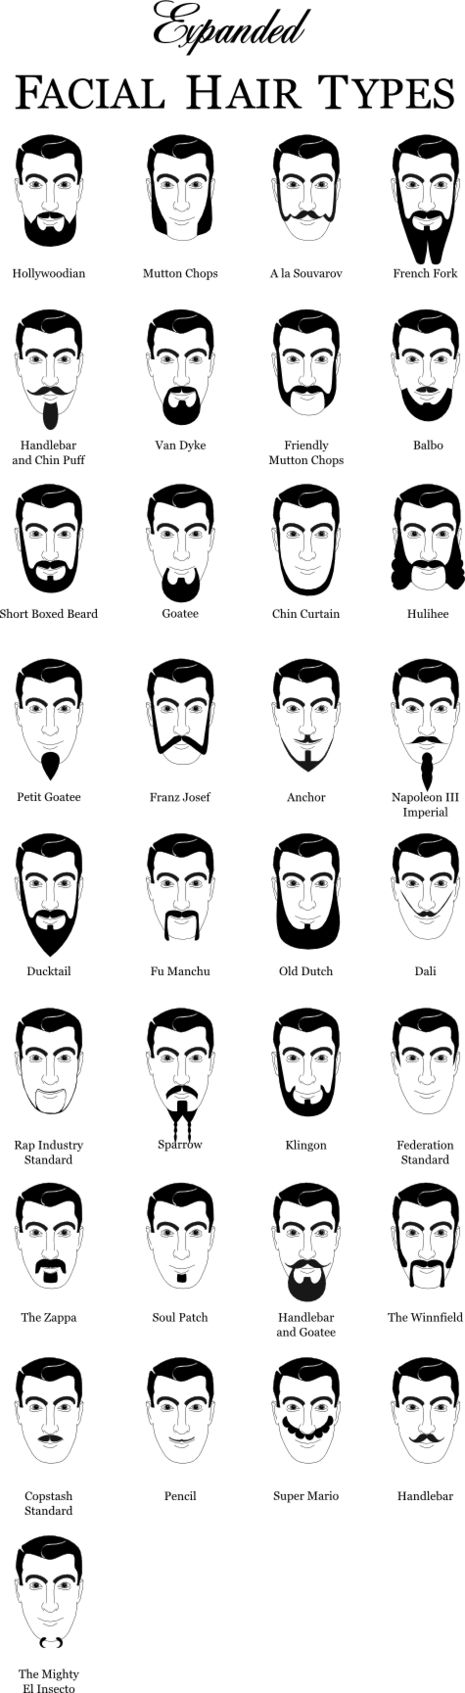 Fabulous 1000 Ideas About Facial Hair Styles On Pinterest Beard Styles Short Hairstyles For Black Women Fulllsitofus